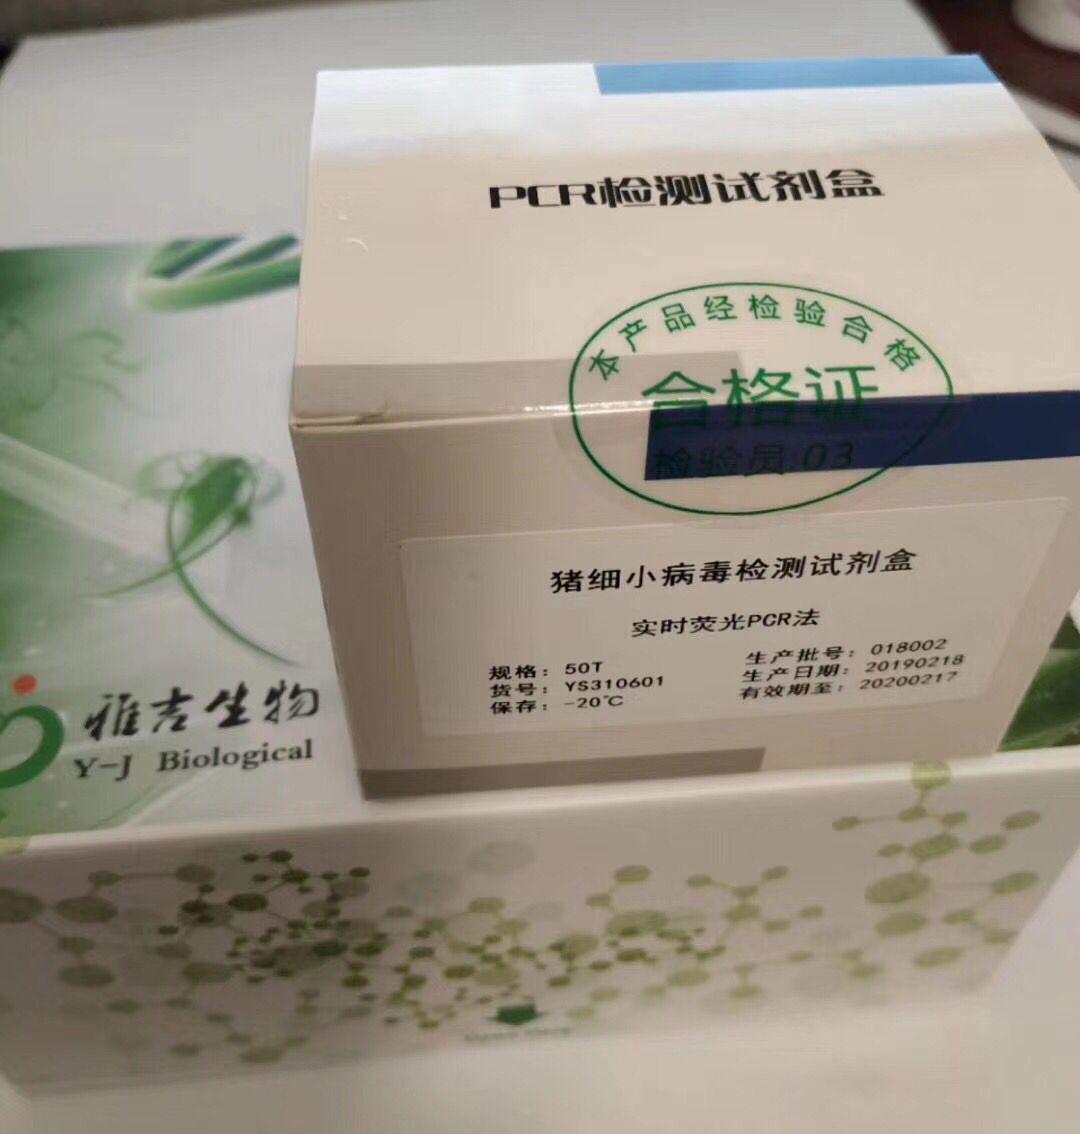 Porcine Epidemic Diarrhea Virus(PEDV)猪流行性腹泻病毒染料法荧光定量RT-PCR试剂盒14-4150050次   14-41500(原11-200) 猪流行性腹泻病毒定量RT-PCR试剂盒